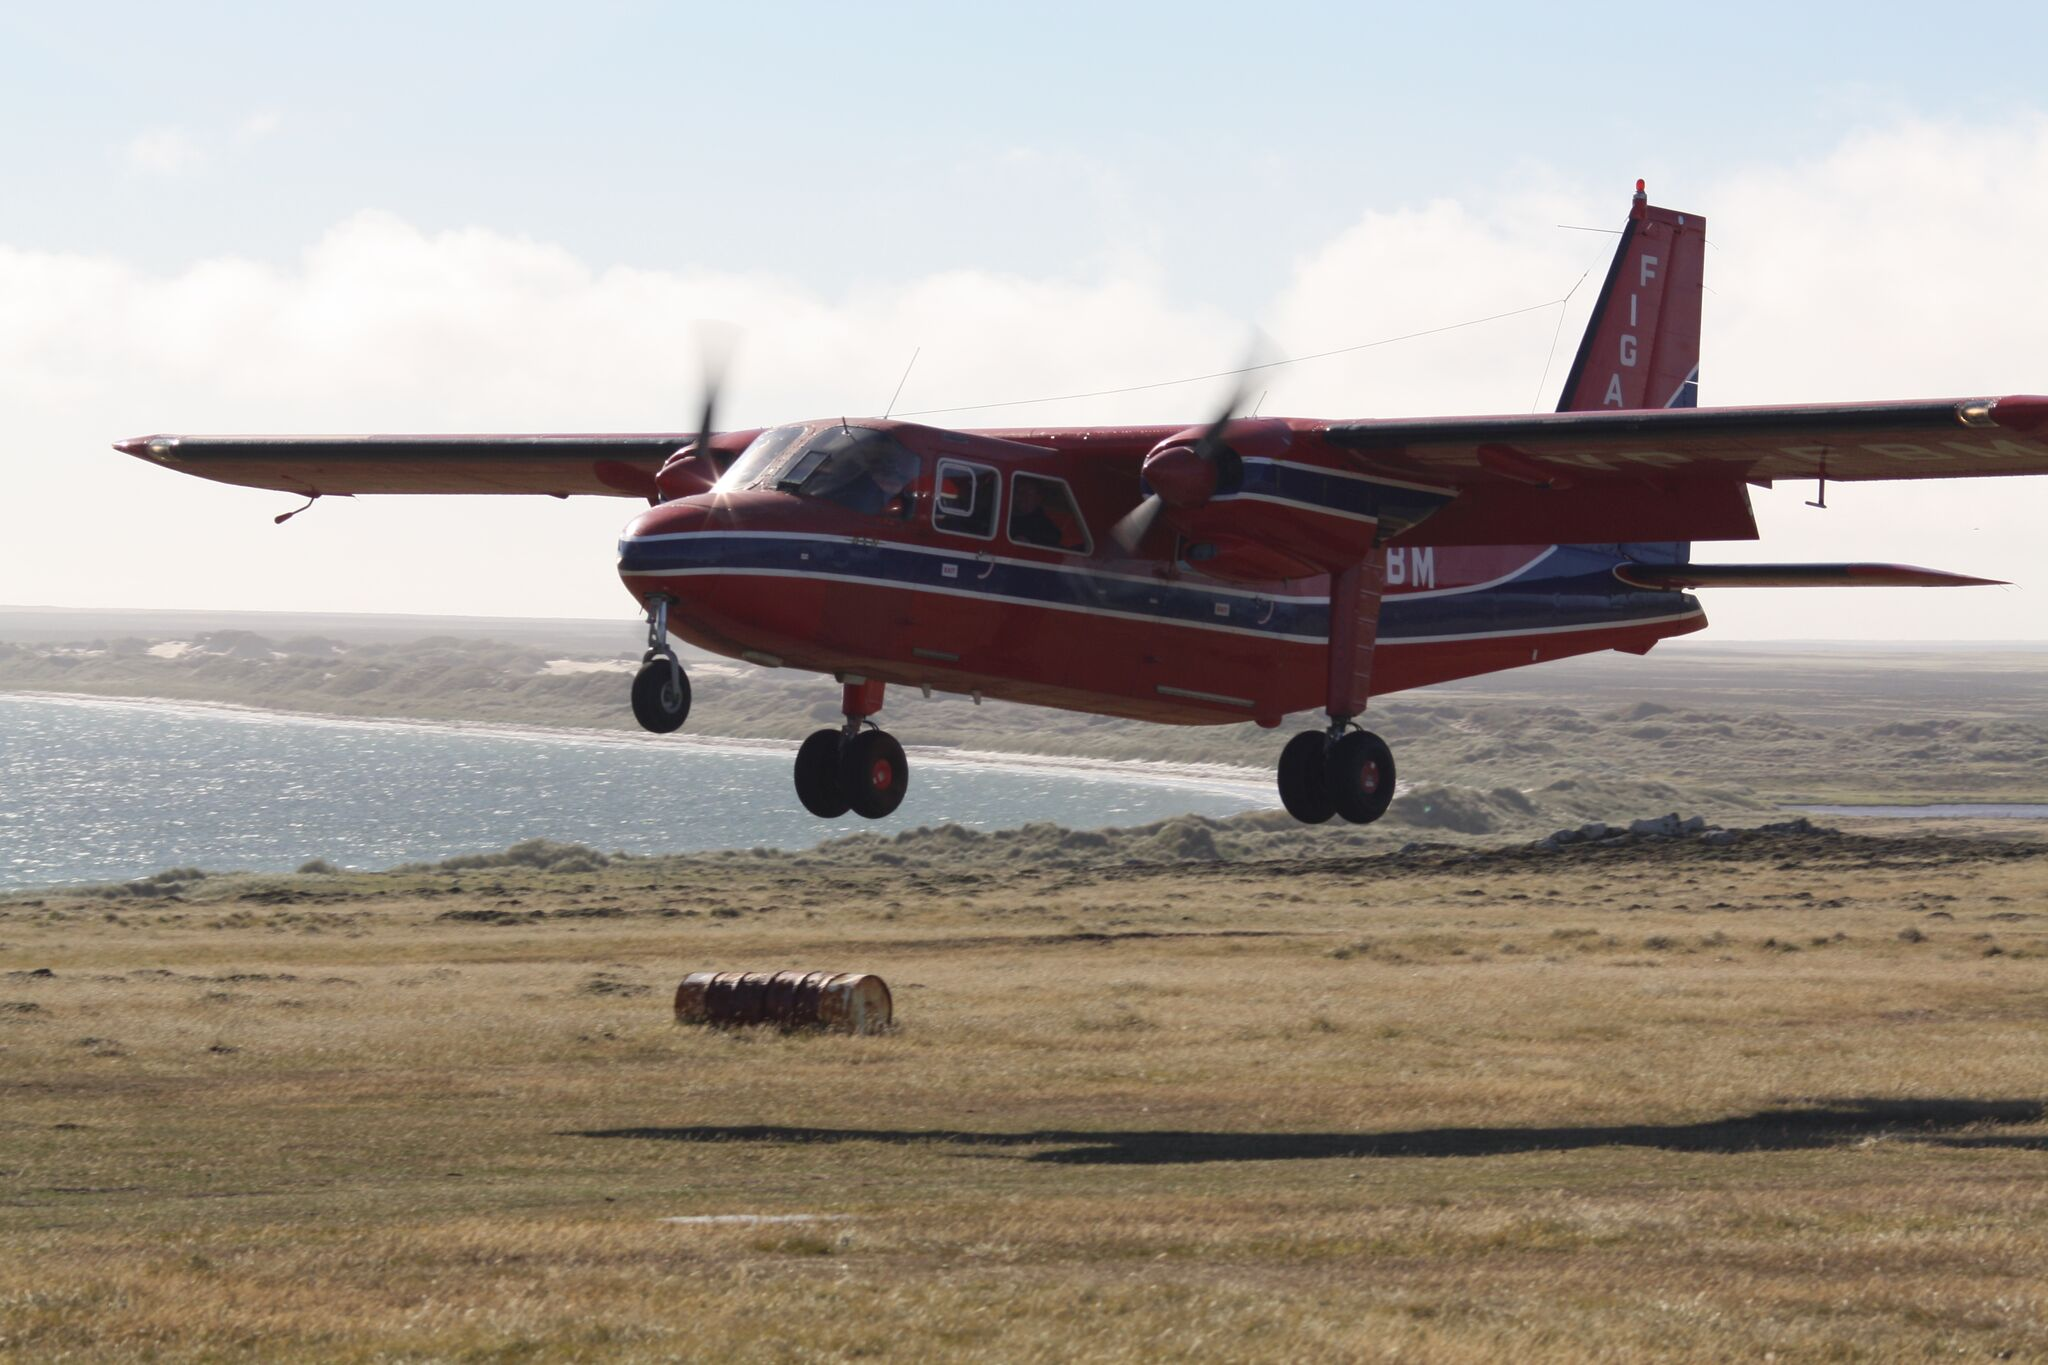 The Flight from Pebble Island